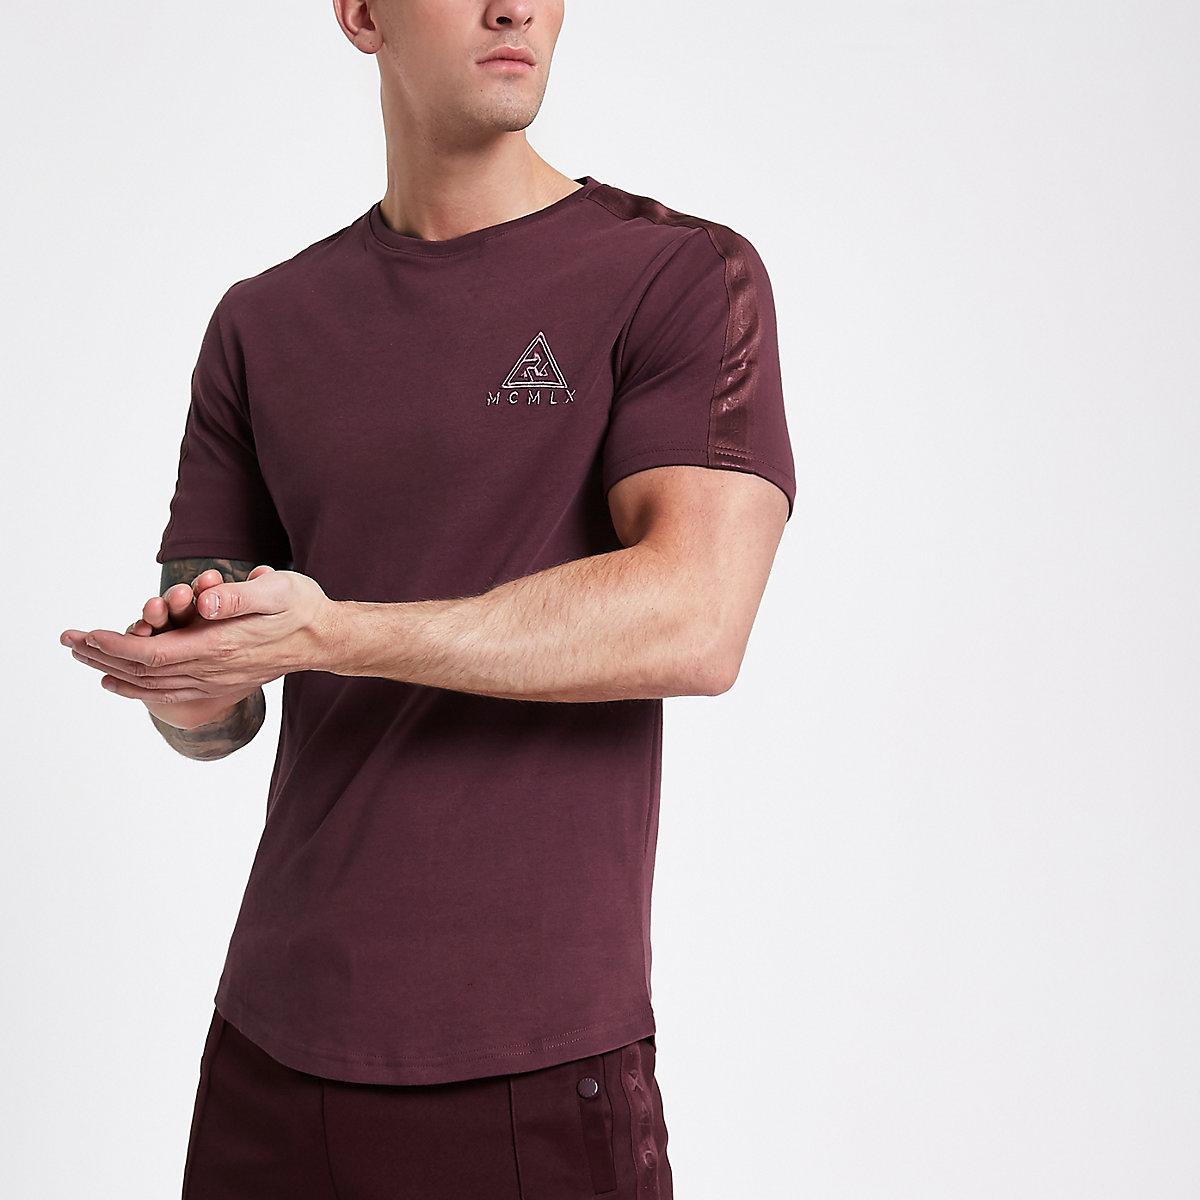 Concept burgundy 'MCMLX' slim fit T-shirt